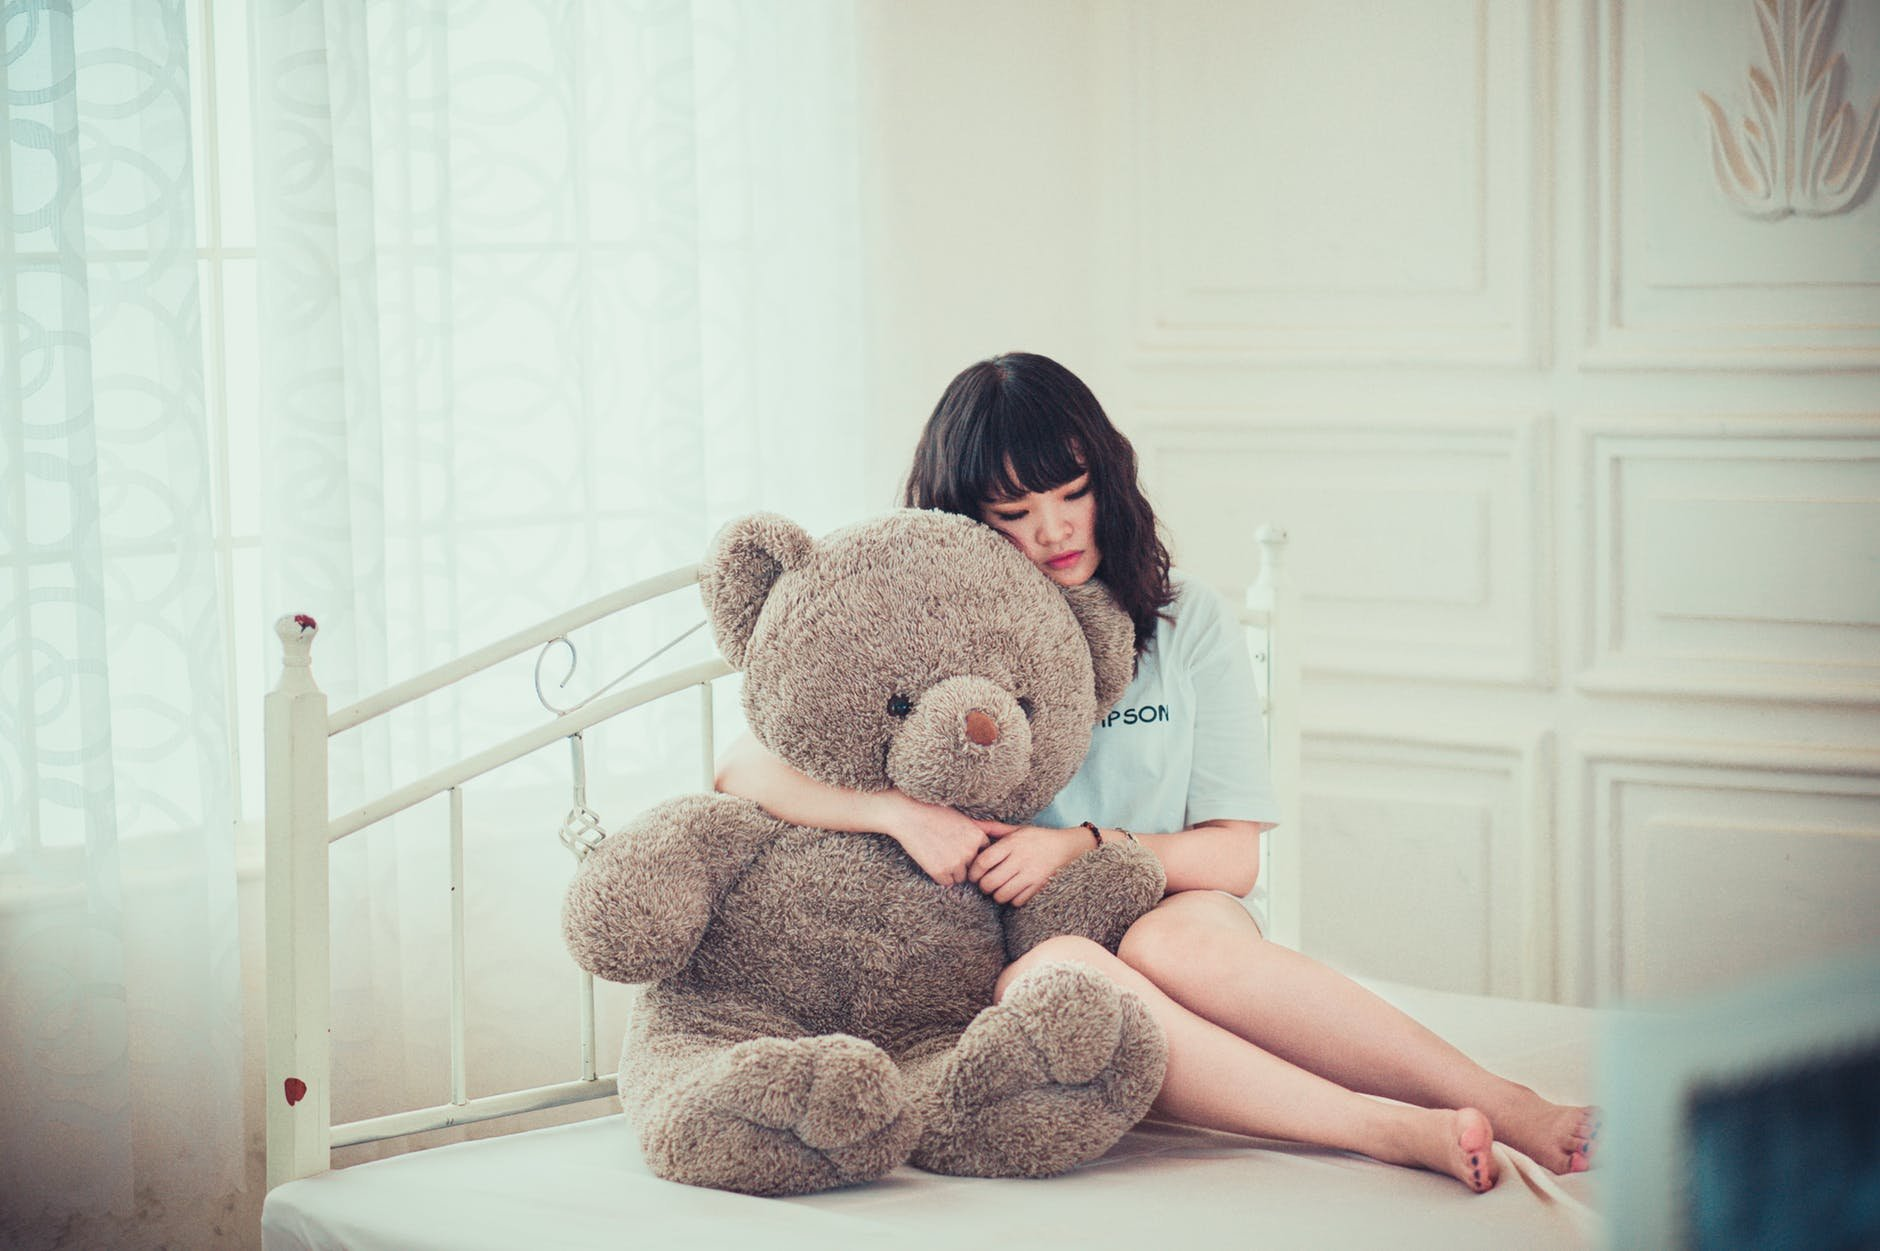 Christian Online Dating Tips · 5 Błędy należy unikać podczas Randki Baran Man.